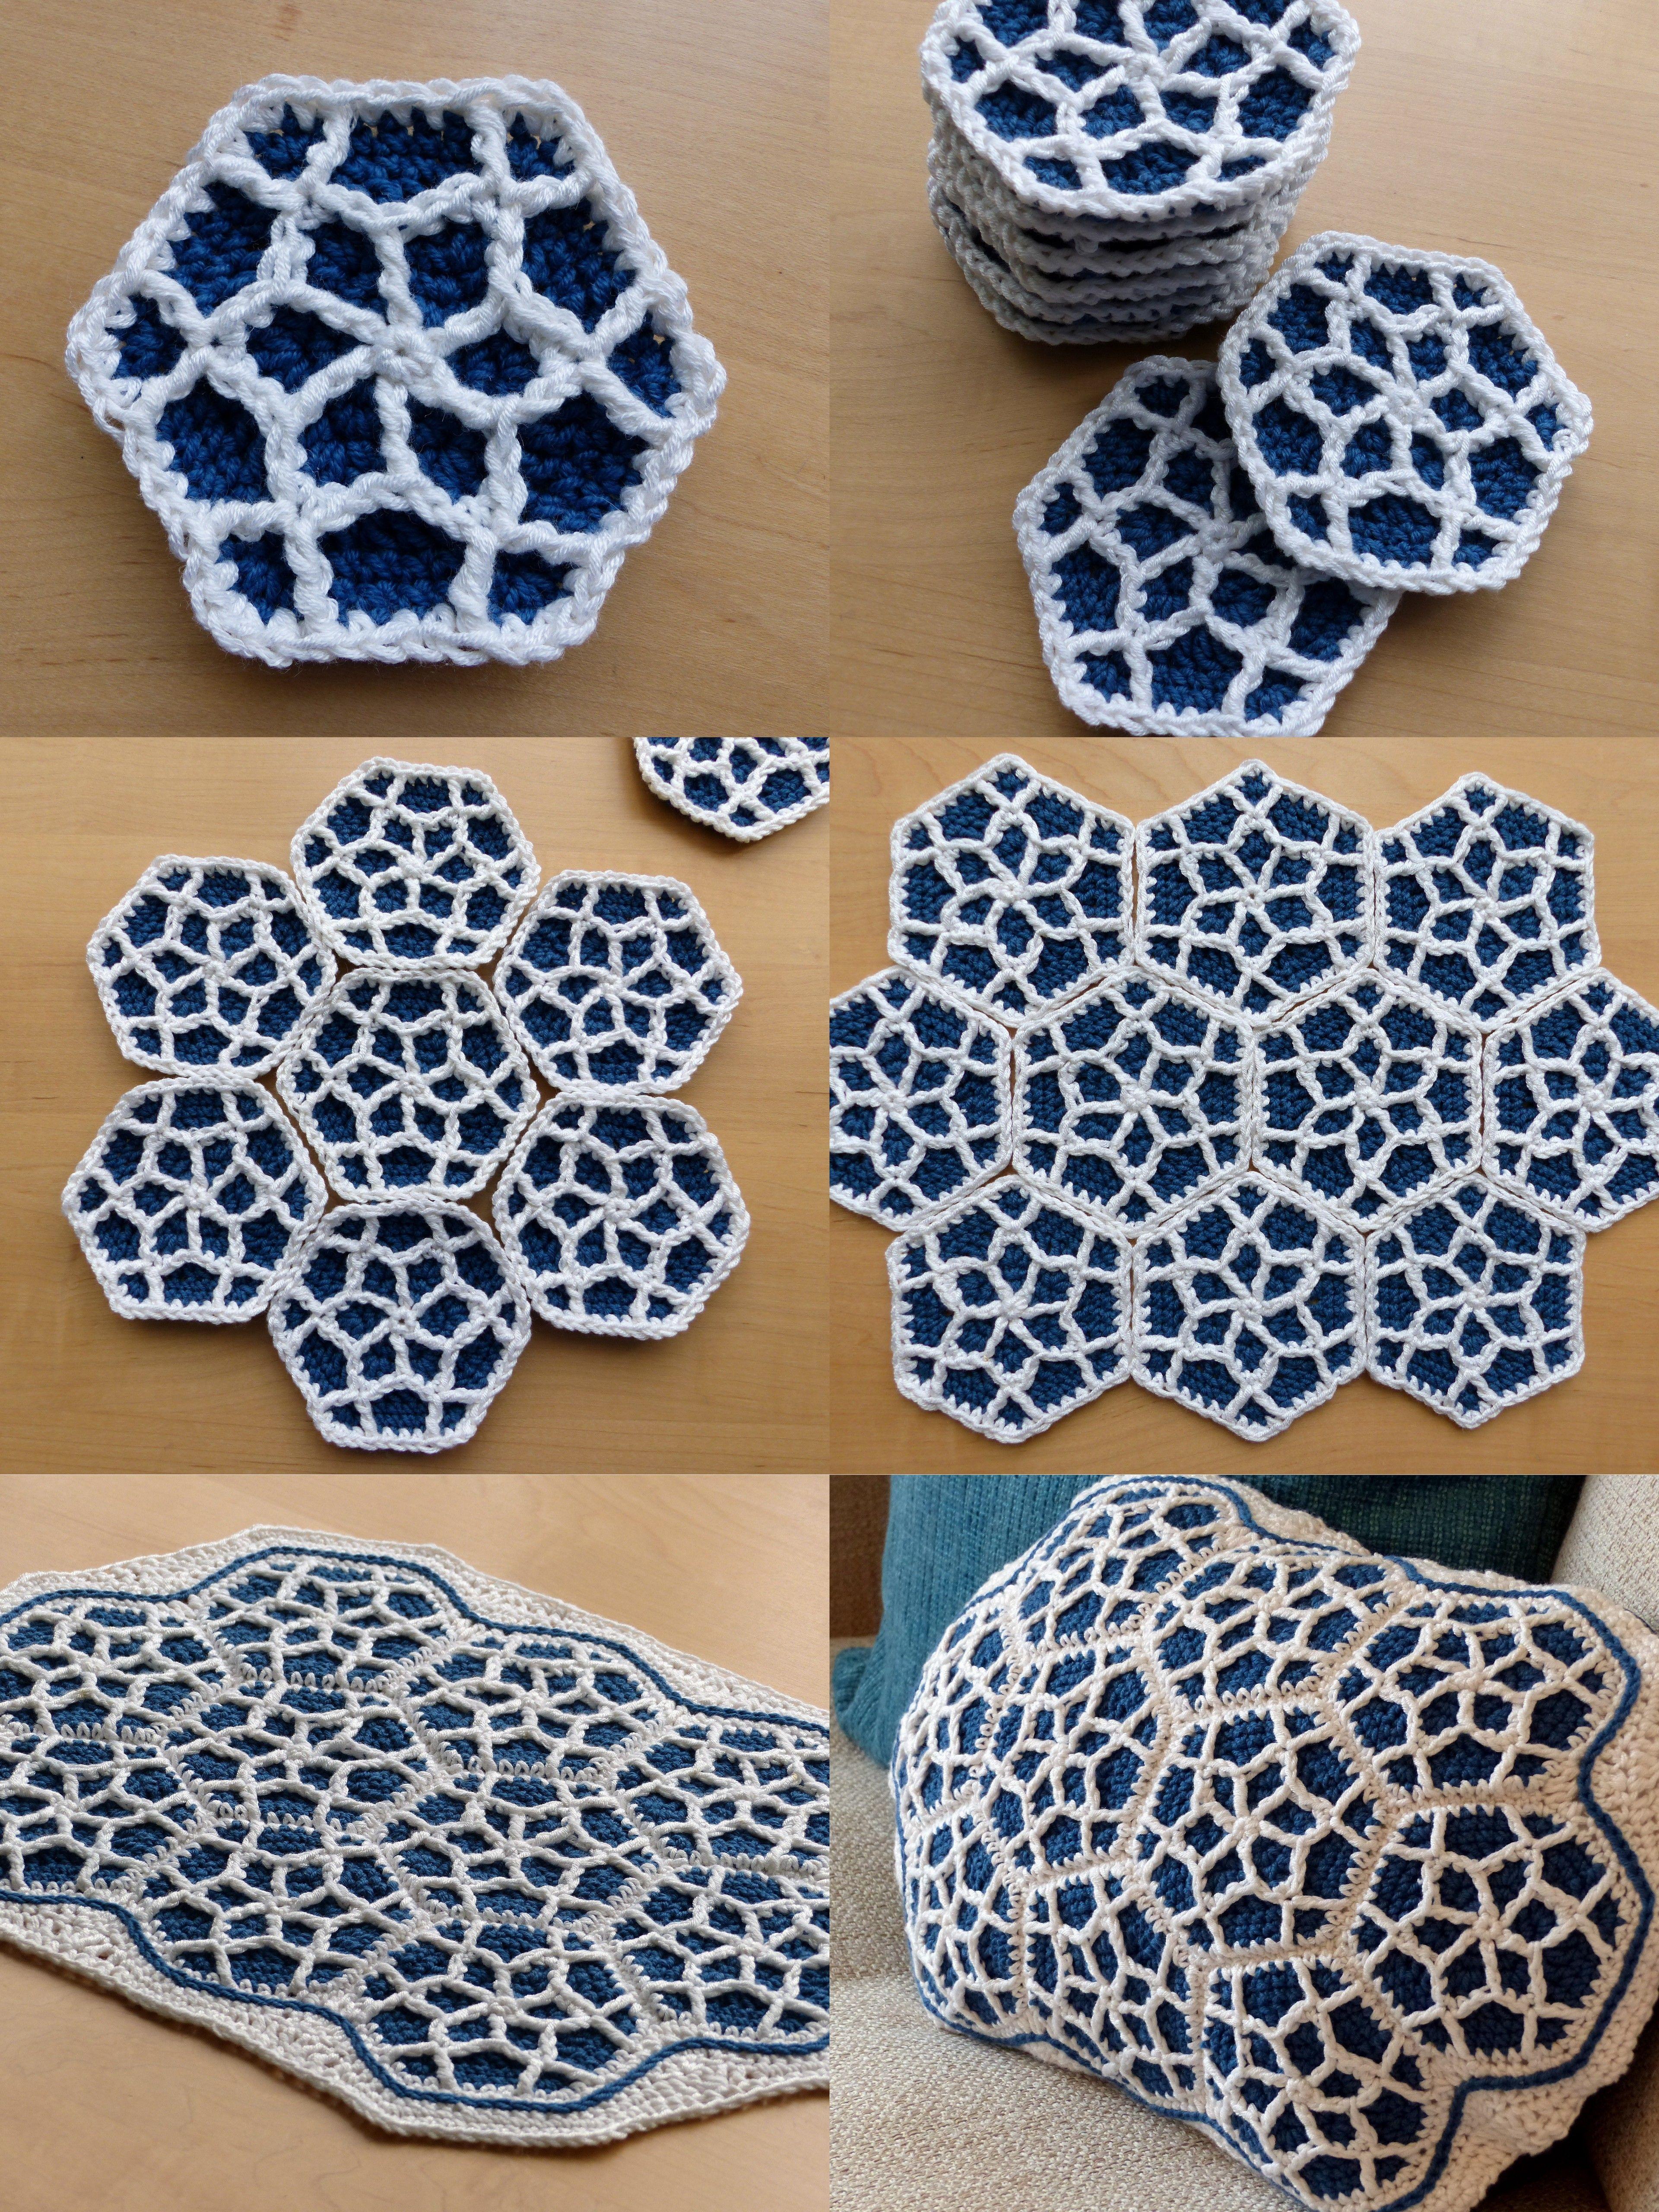 Moroccan Hexagon Motif Free Crochet Pattern T Patrn De Flower Motivos Hexagonales Pinterest Blocking And Making Up By Make My Day Creative